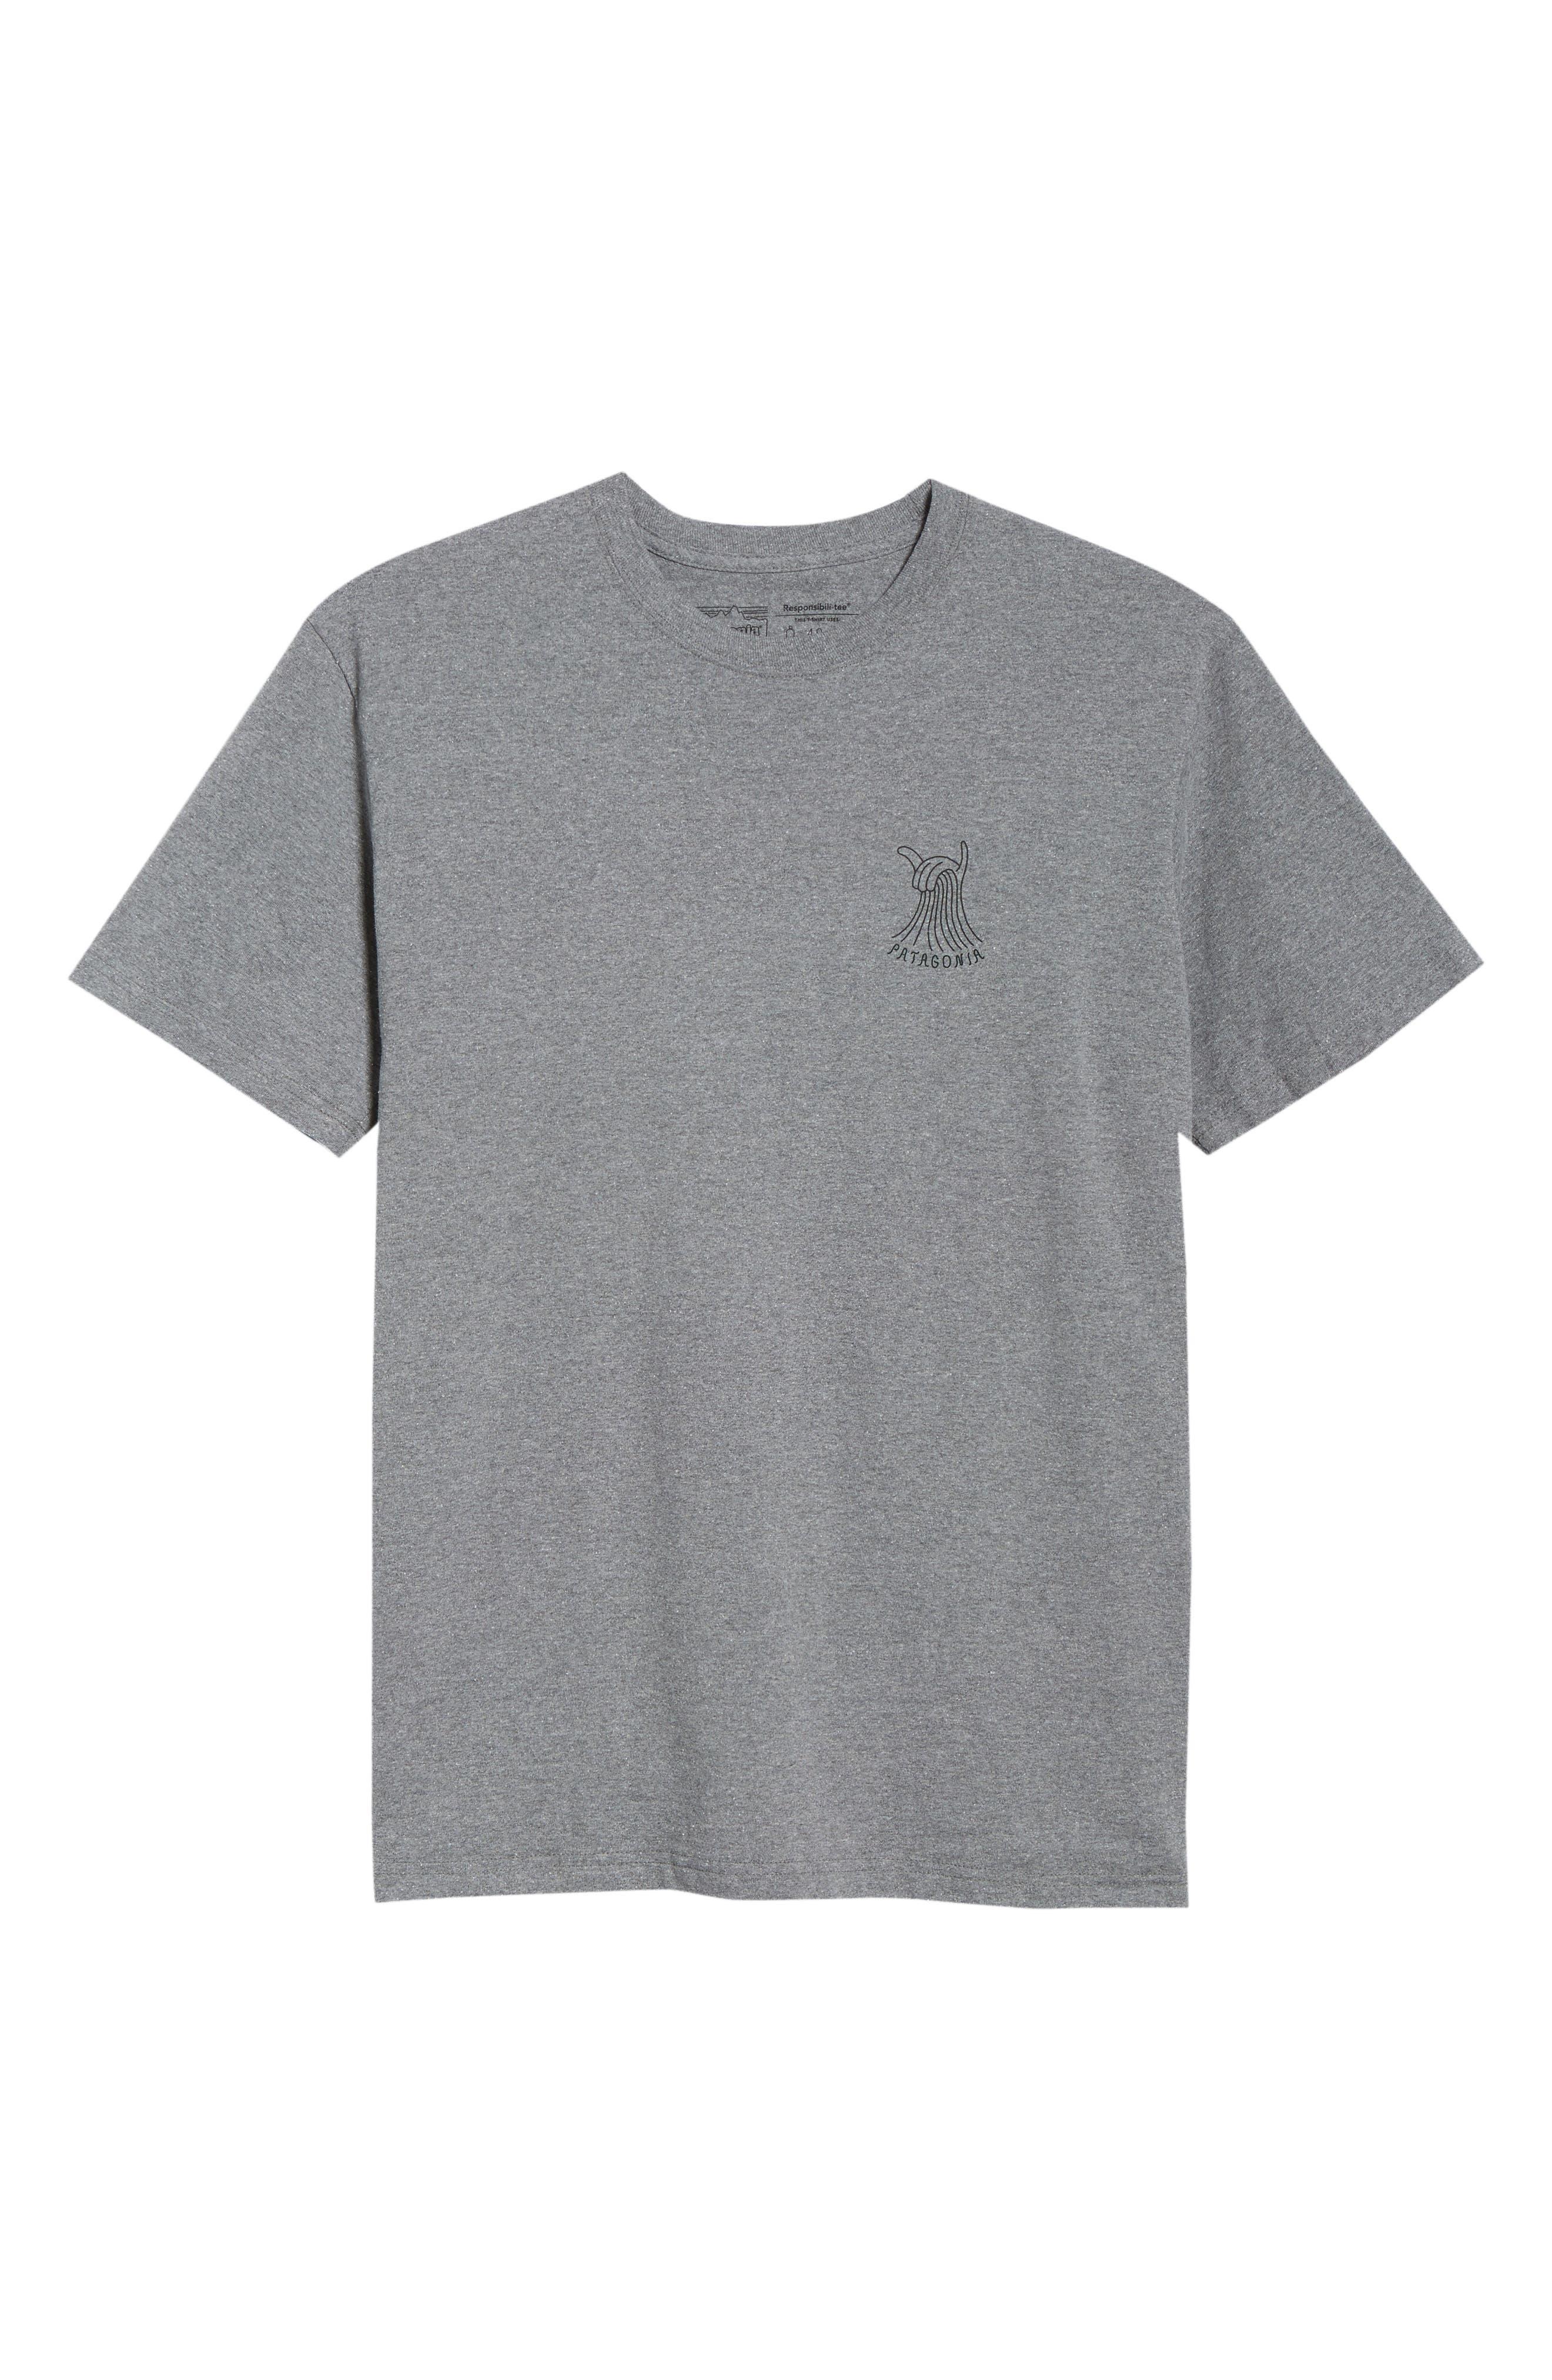 Shaka Wave Slim Fit T-Shirt,                             Alternate thumbnail 6, color,                             GRAVEL HEATHER